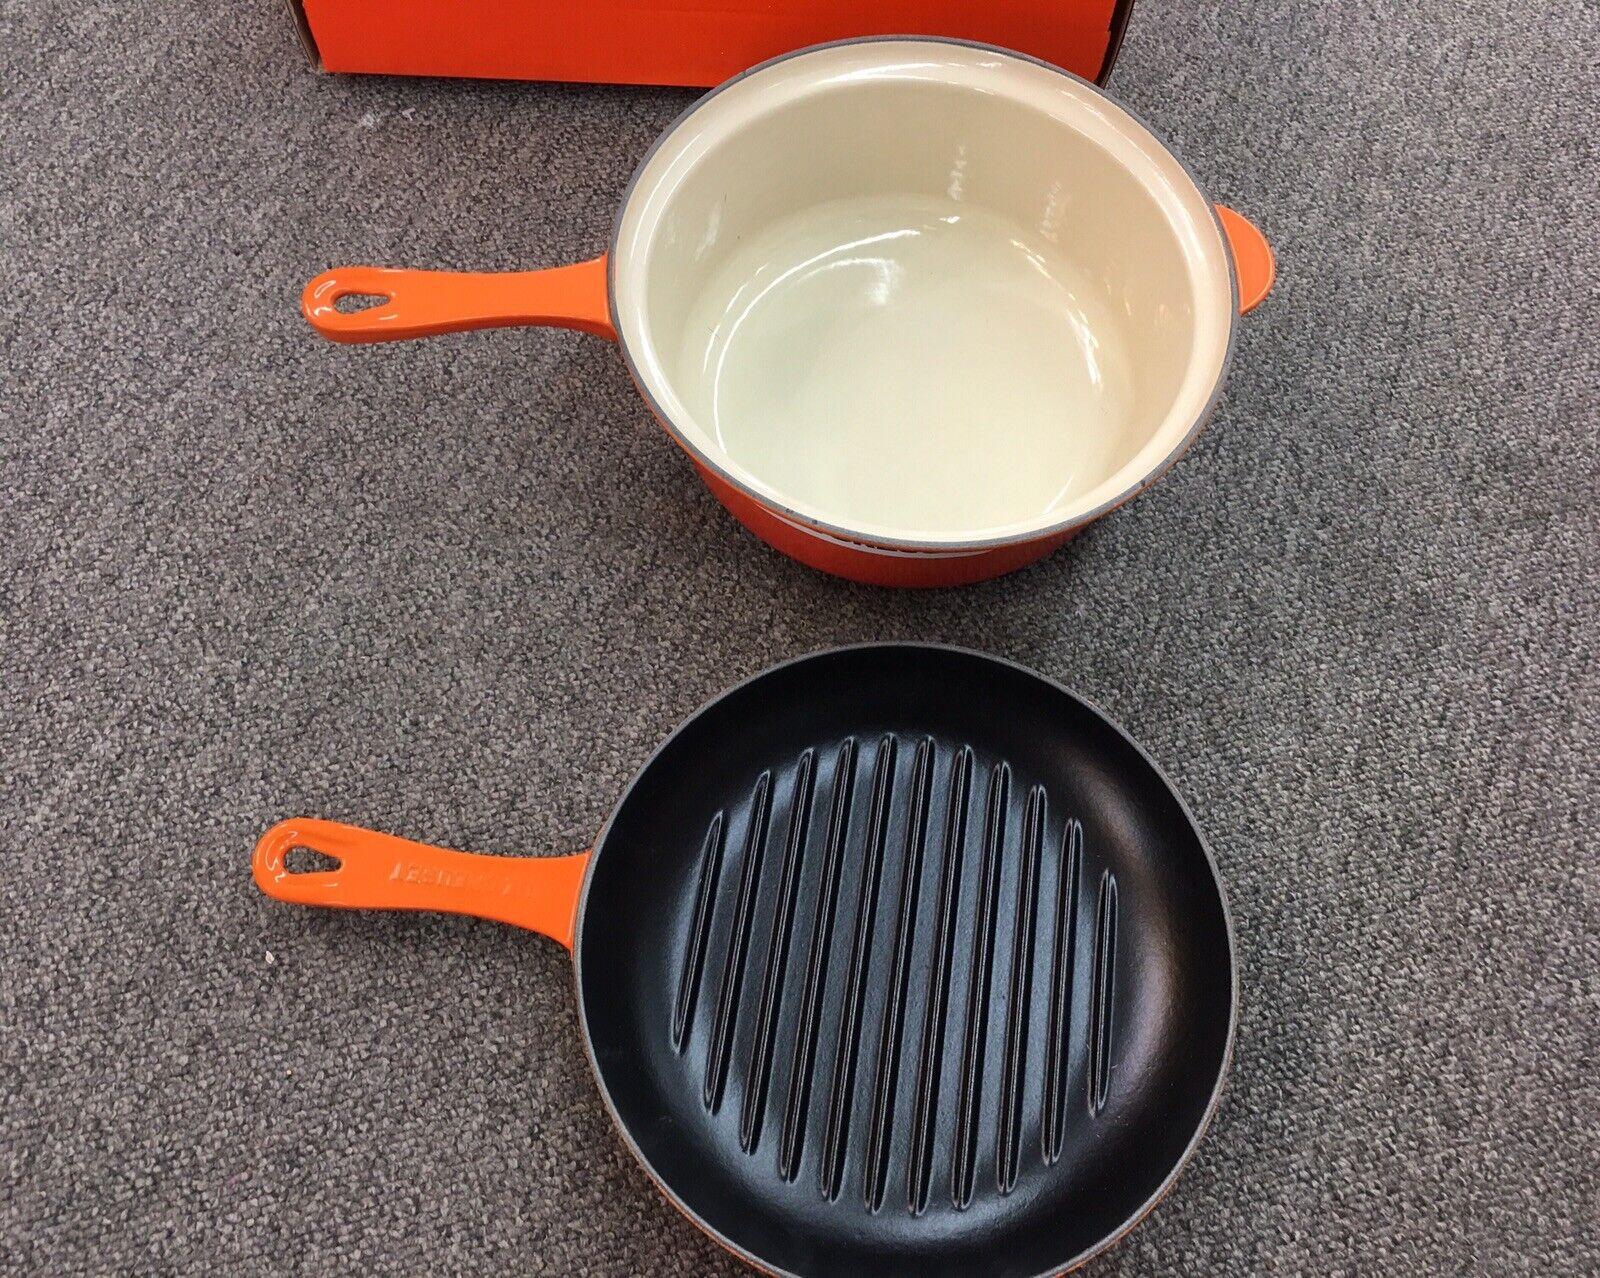 Le Creuset ronde fonte multifonction 2in1 Pan multifonction grill Couvercle 3.75 Q